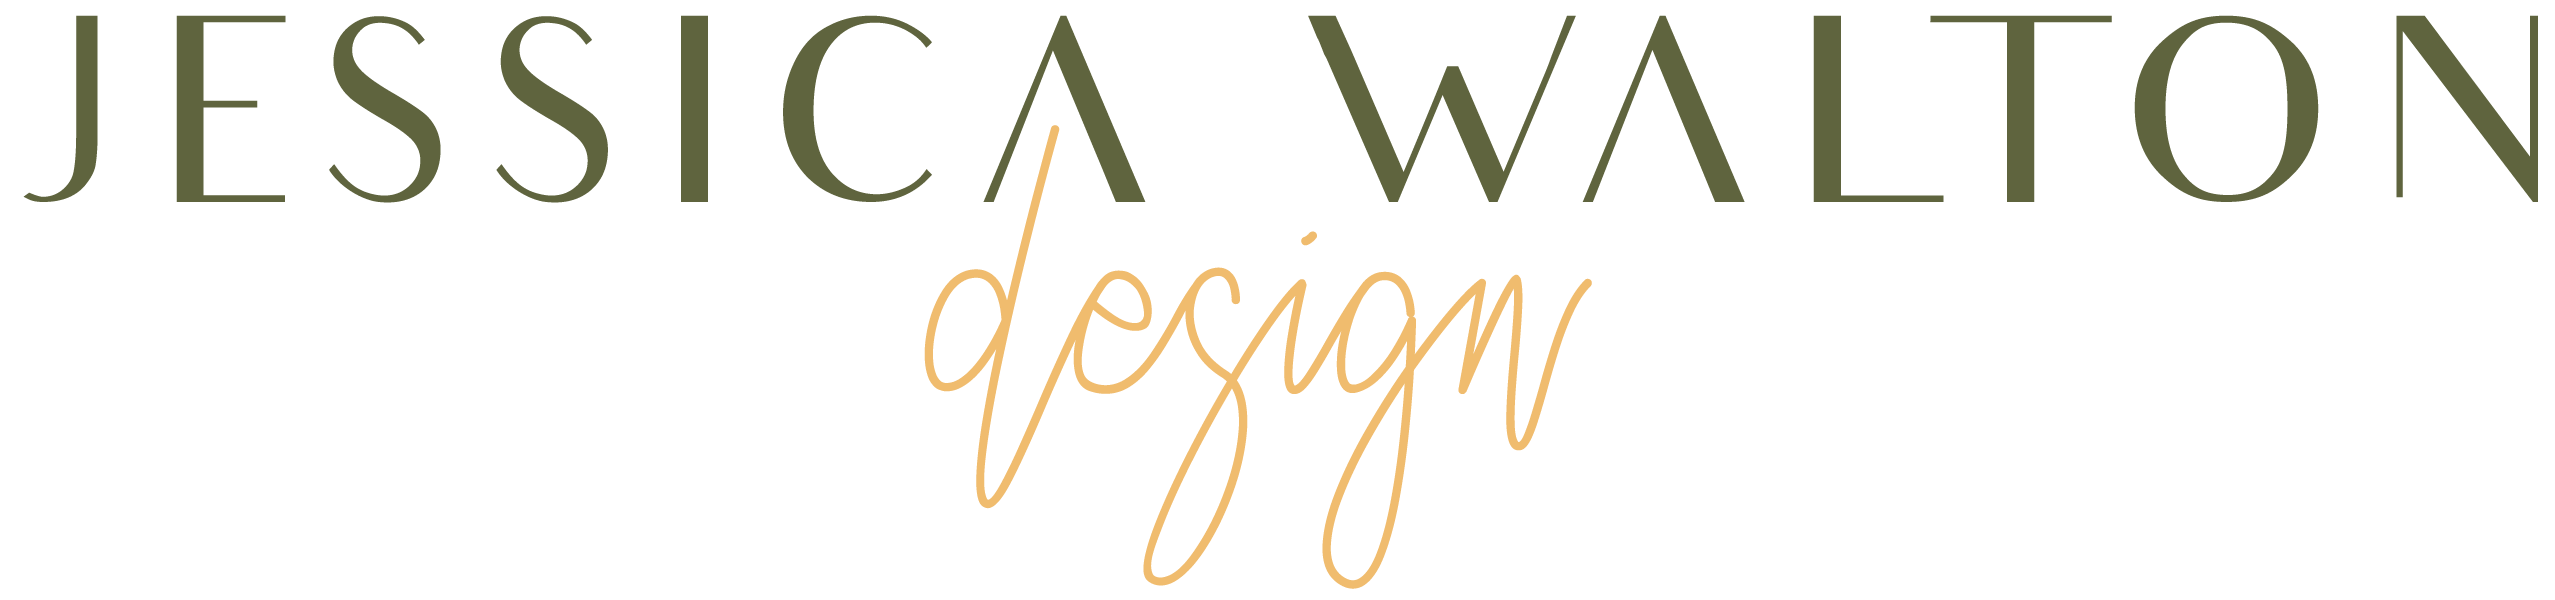 Jessica Walton Design